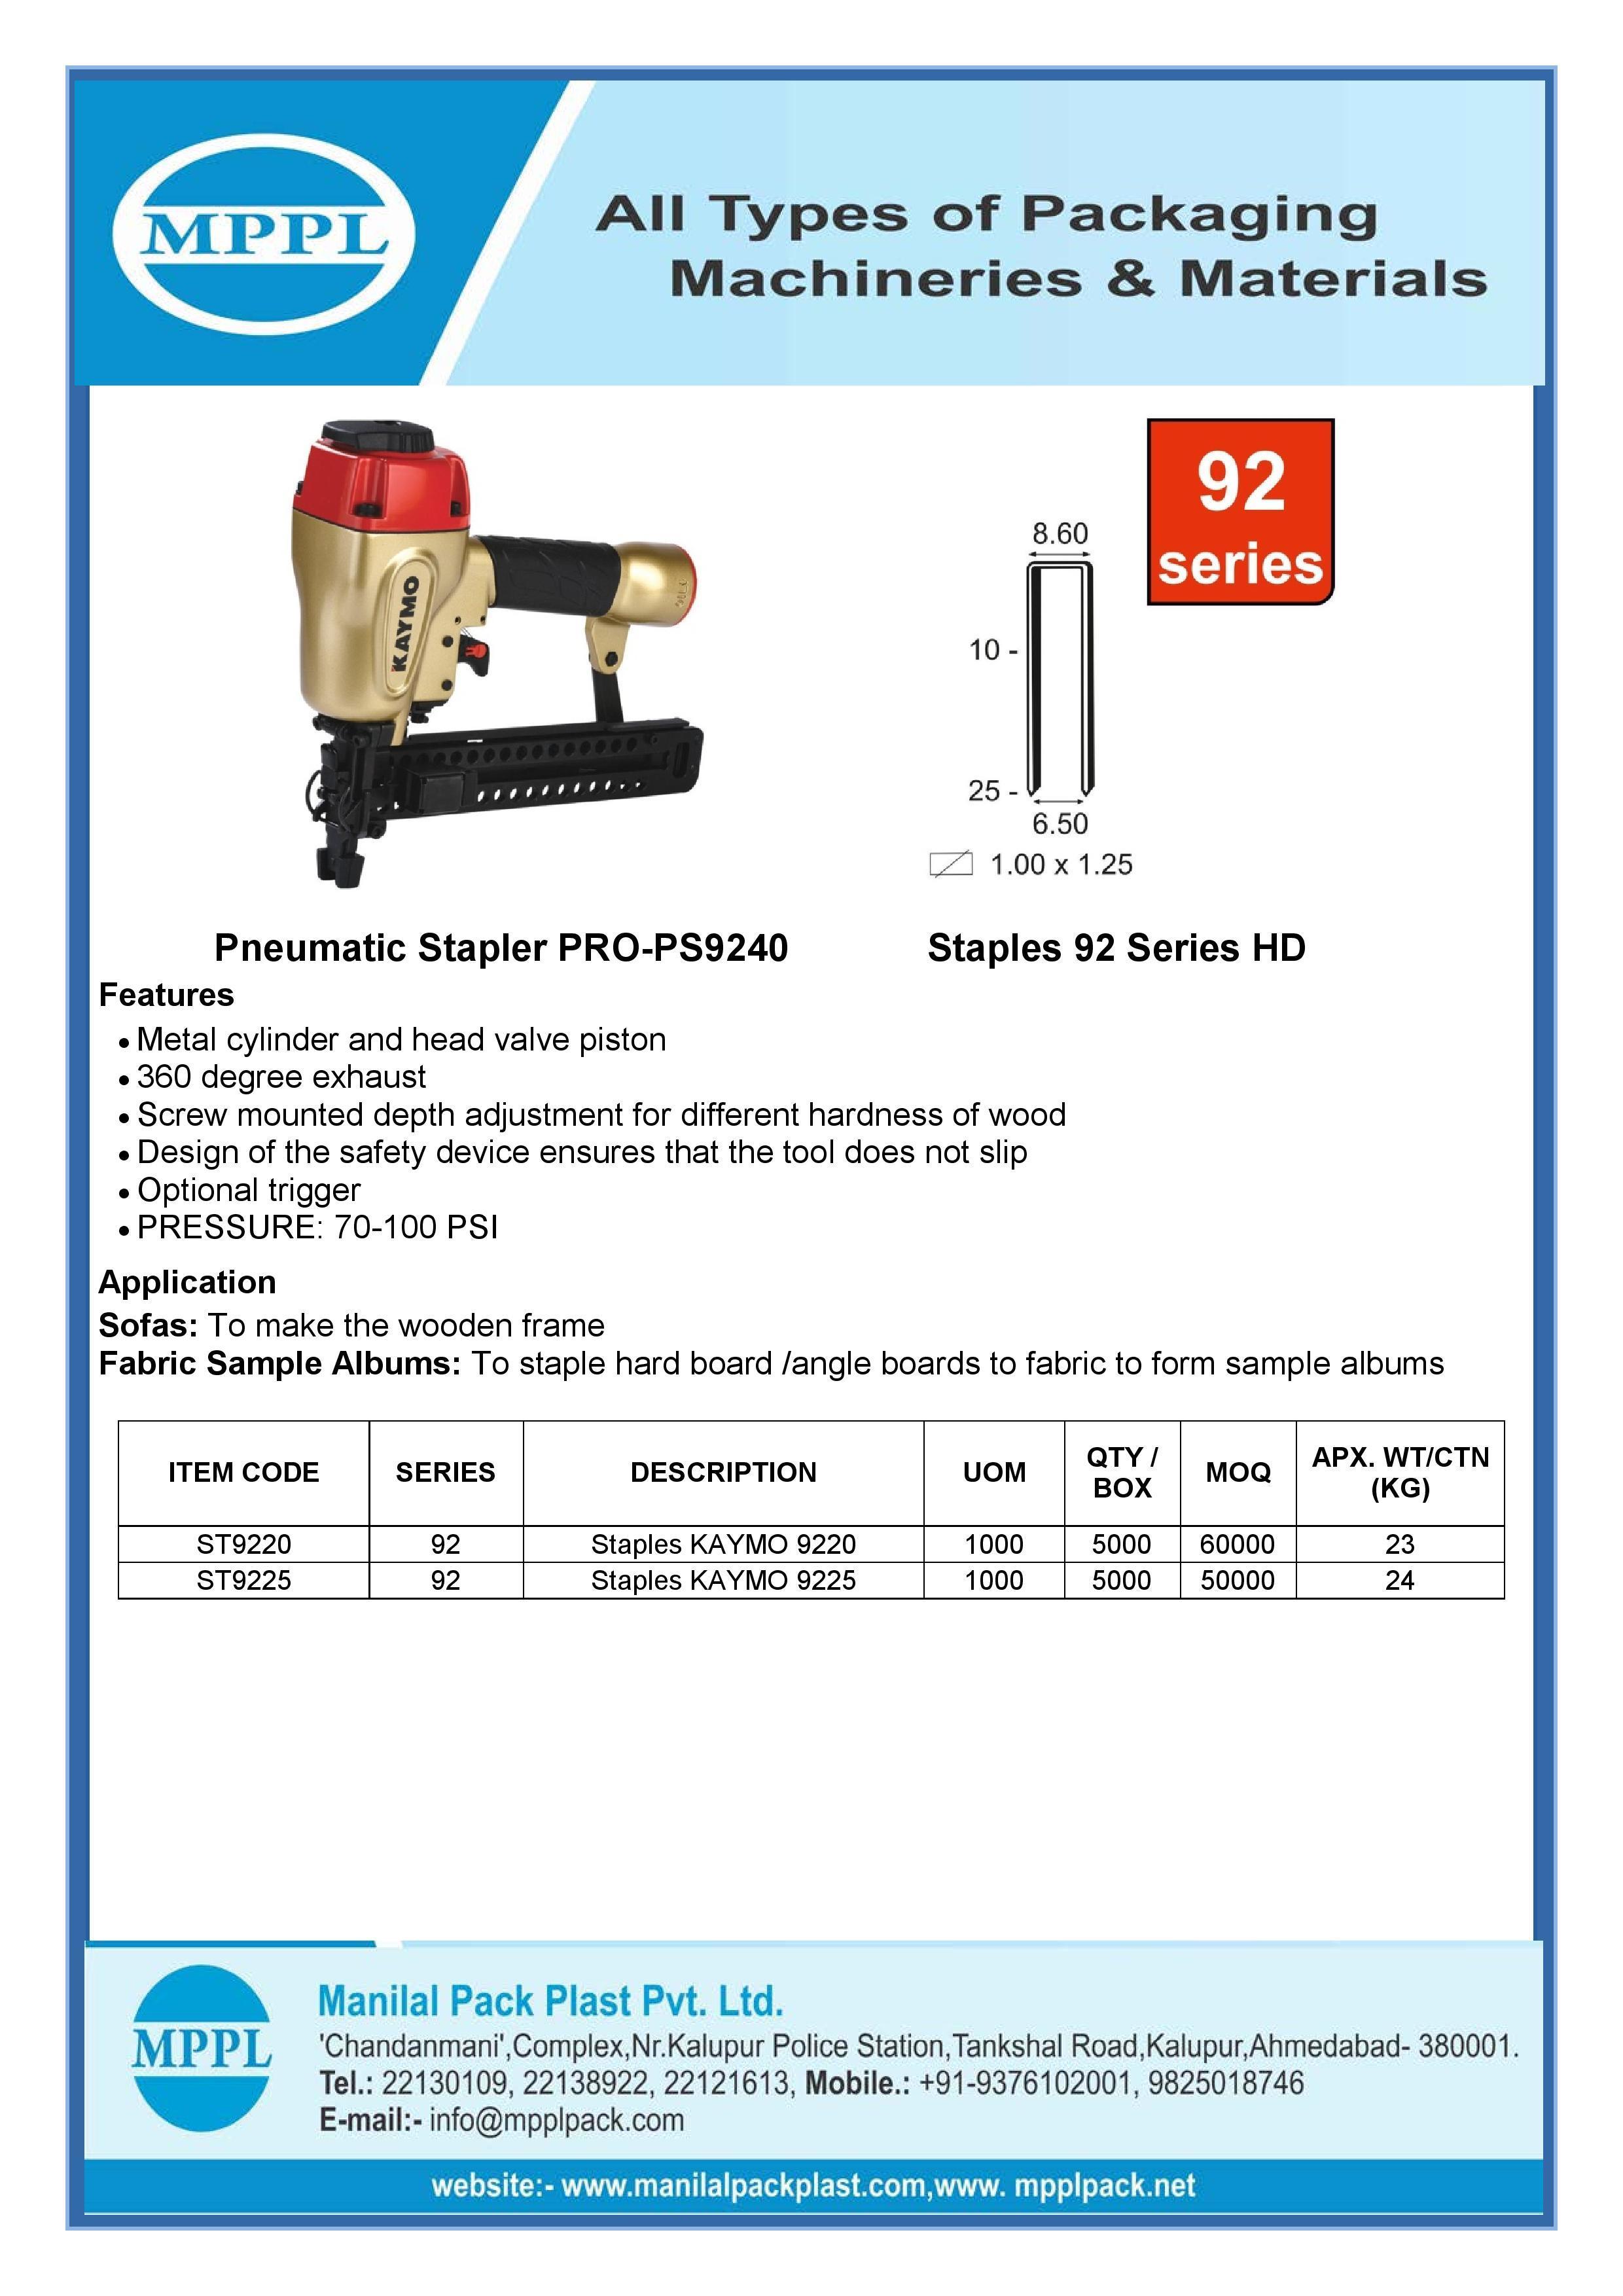 Pneumatic Stapler PRO-PS9240